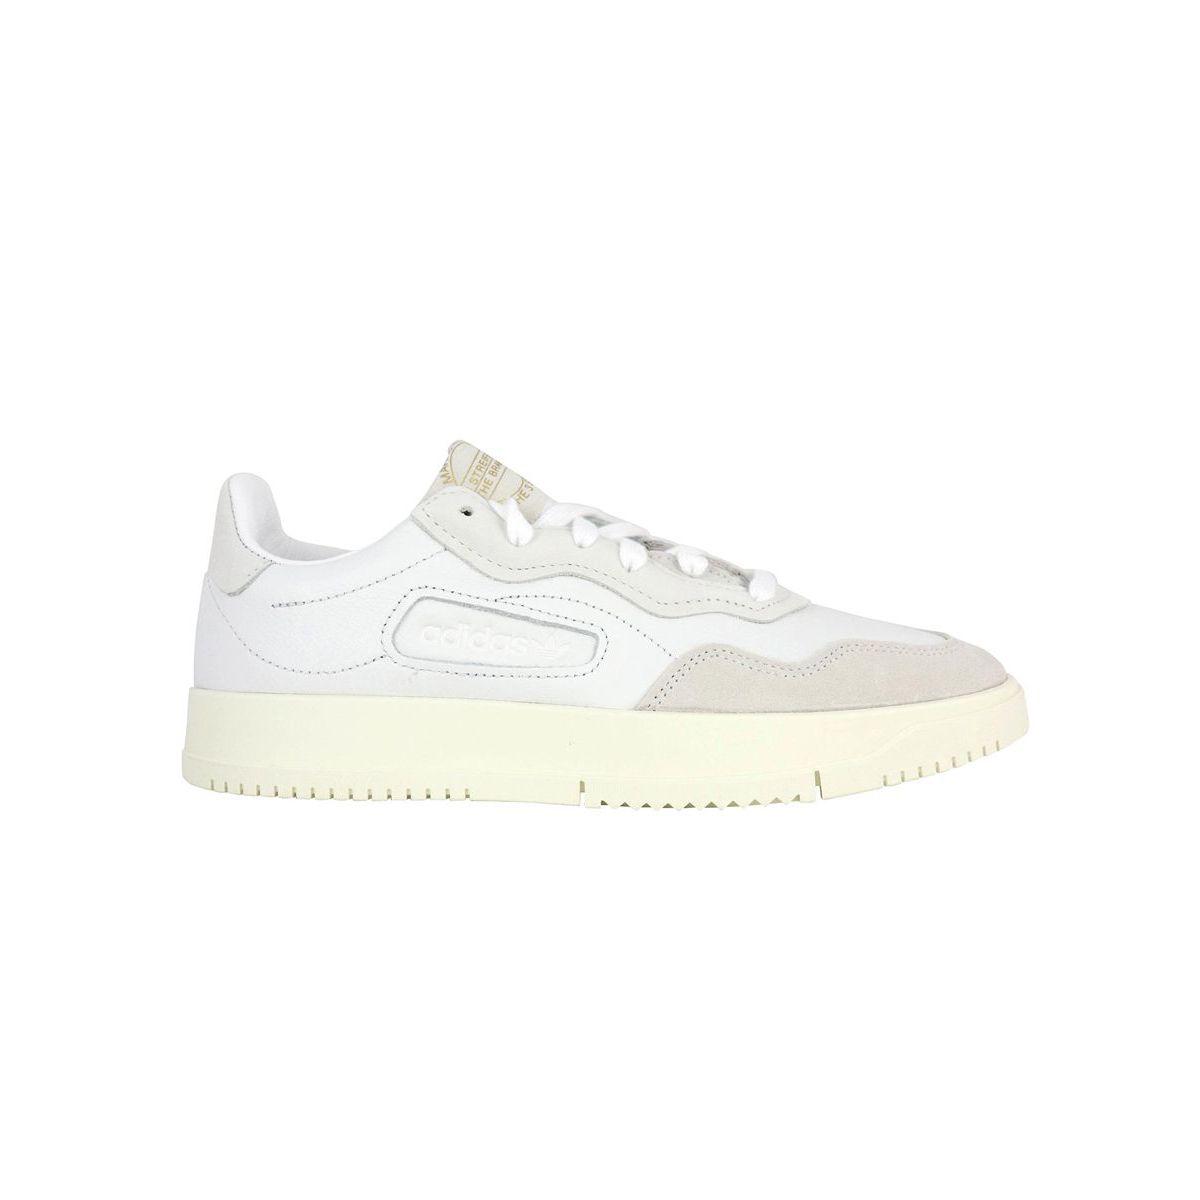 Sneakers SC Premiere EE7720 White Adidas